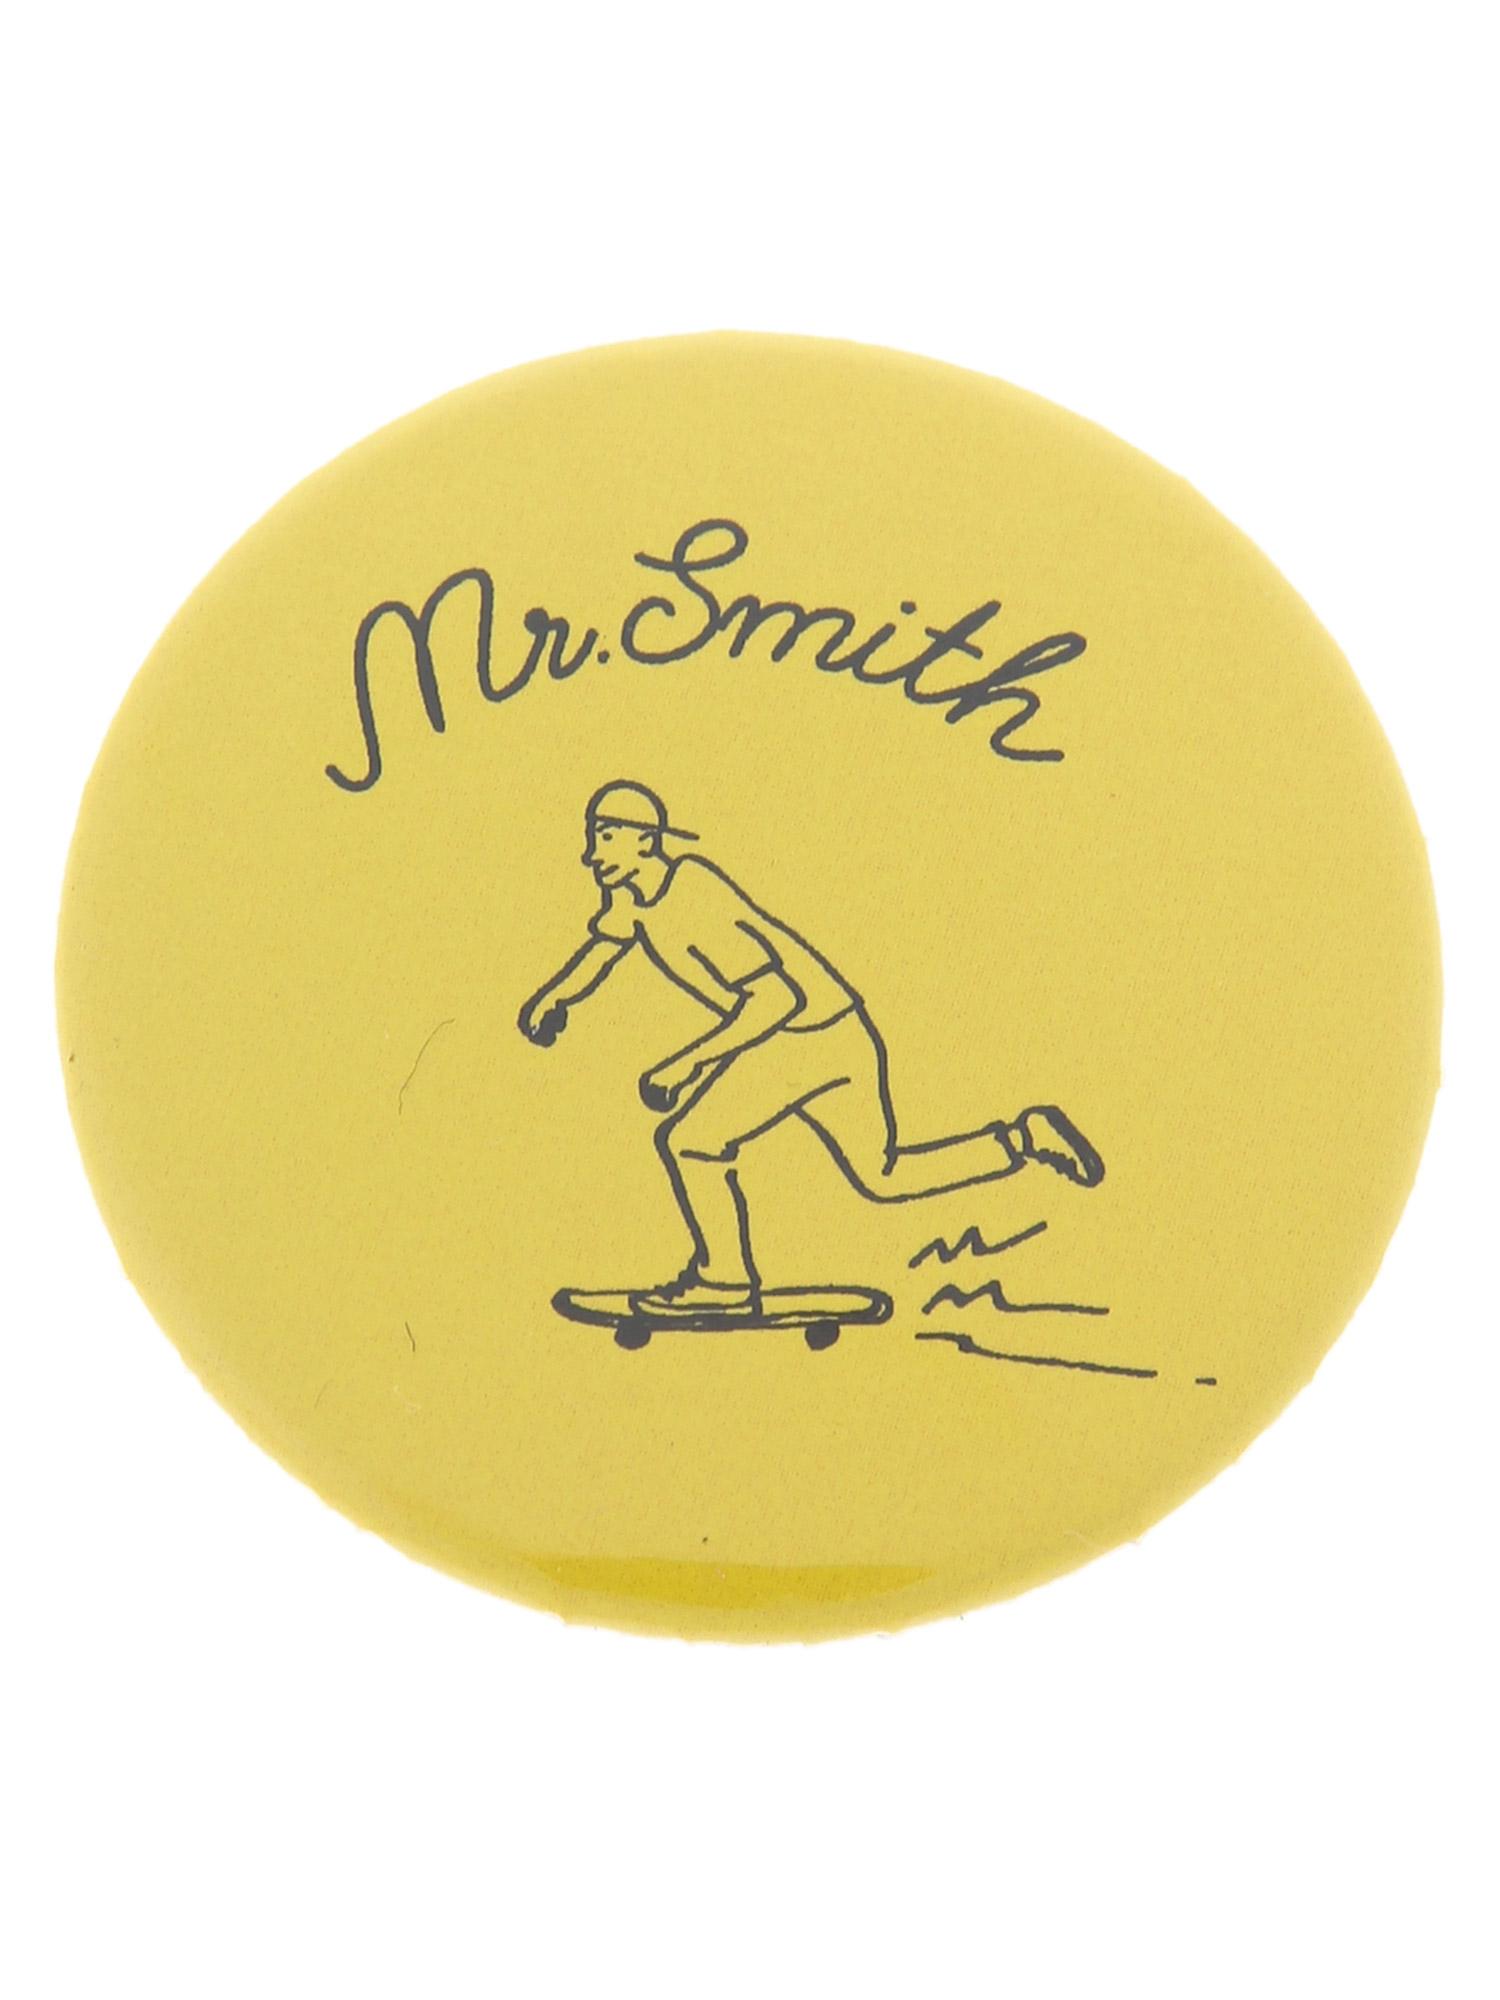 WEGO/MrSmith缶バッジ